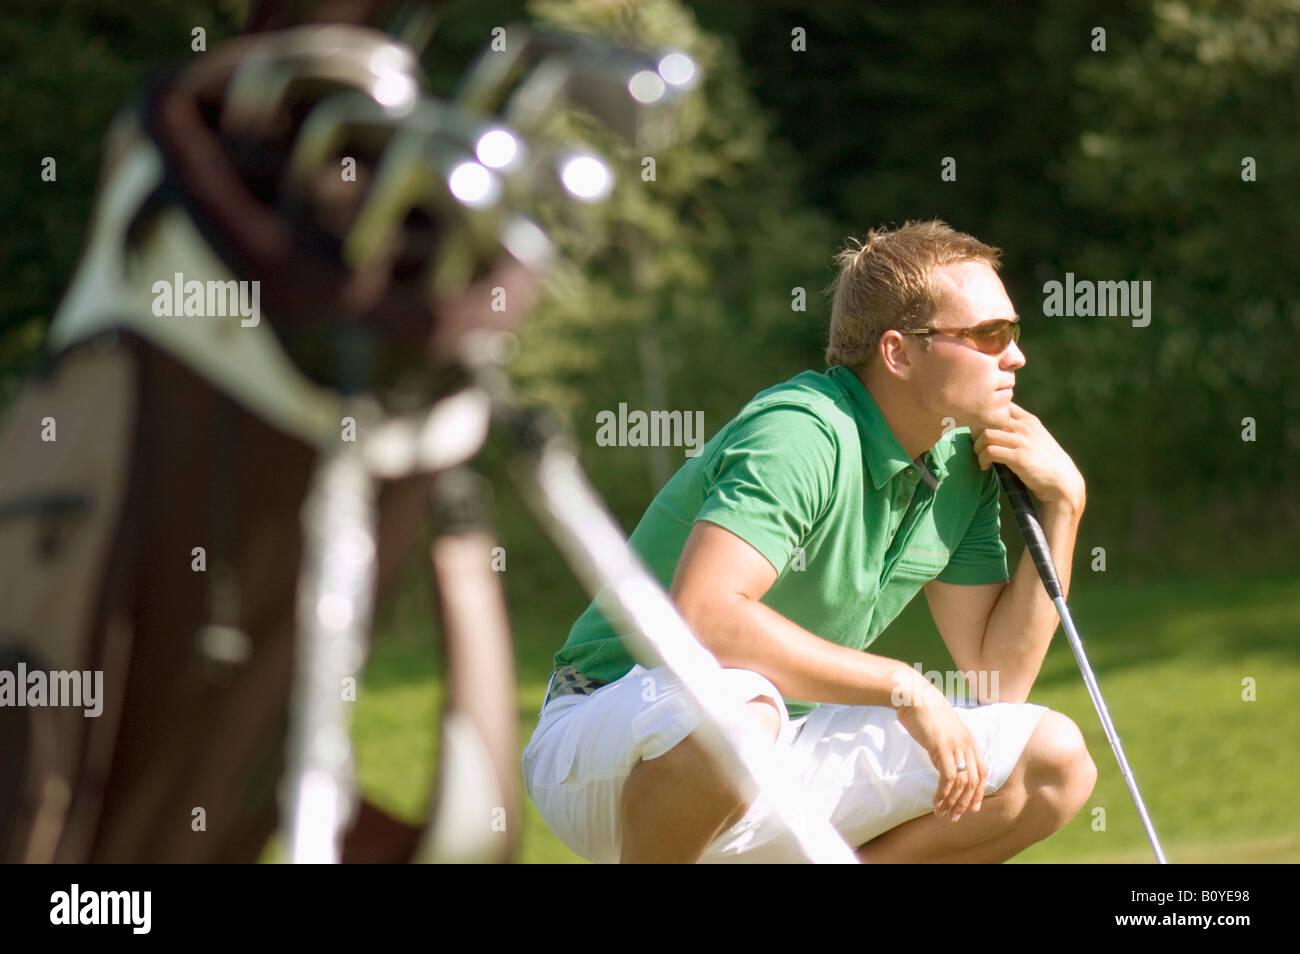 Golf player squatting, musing - Stock Image